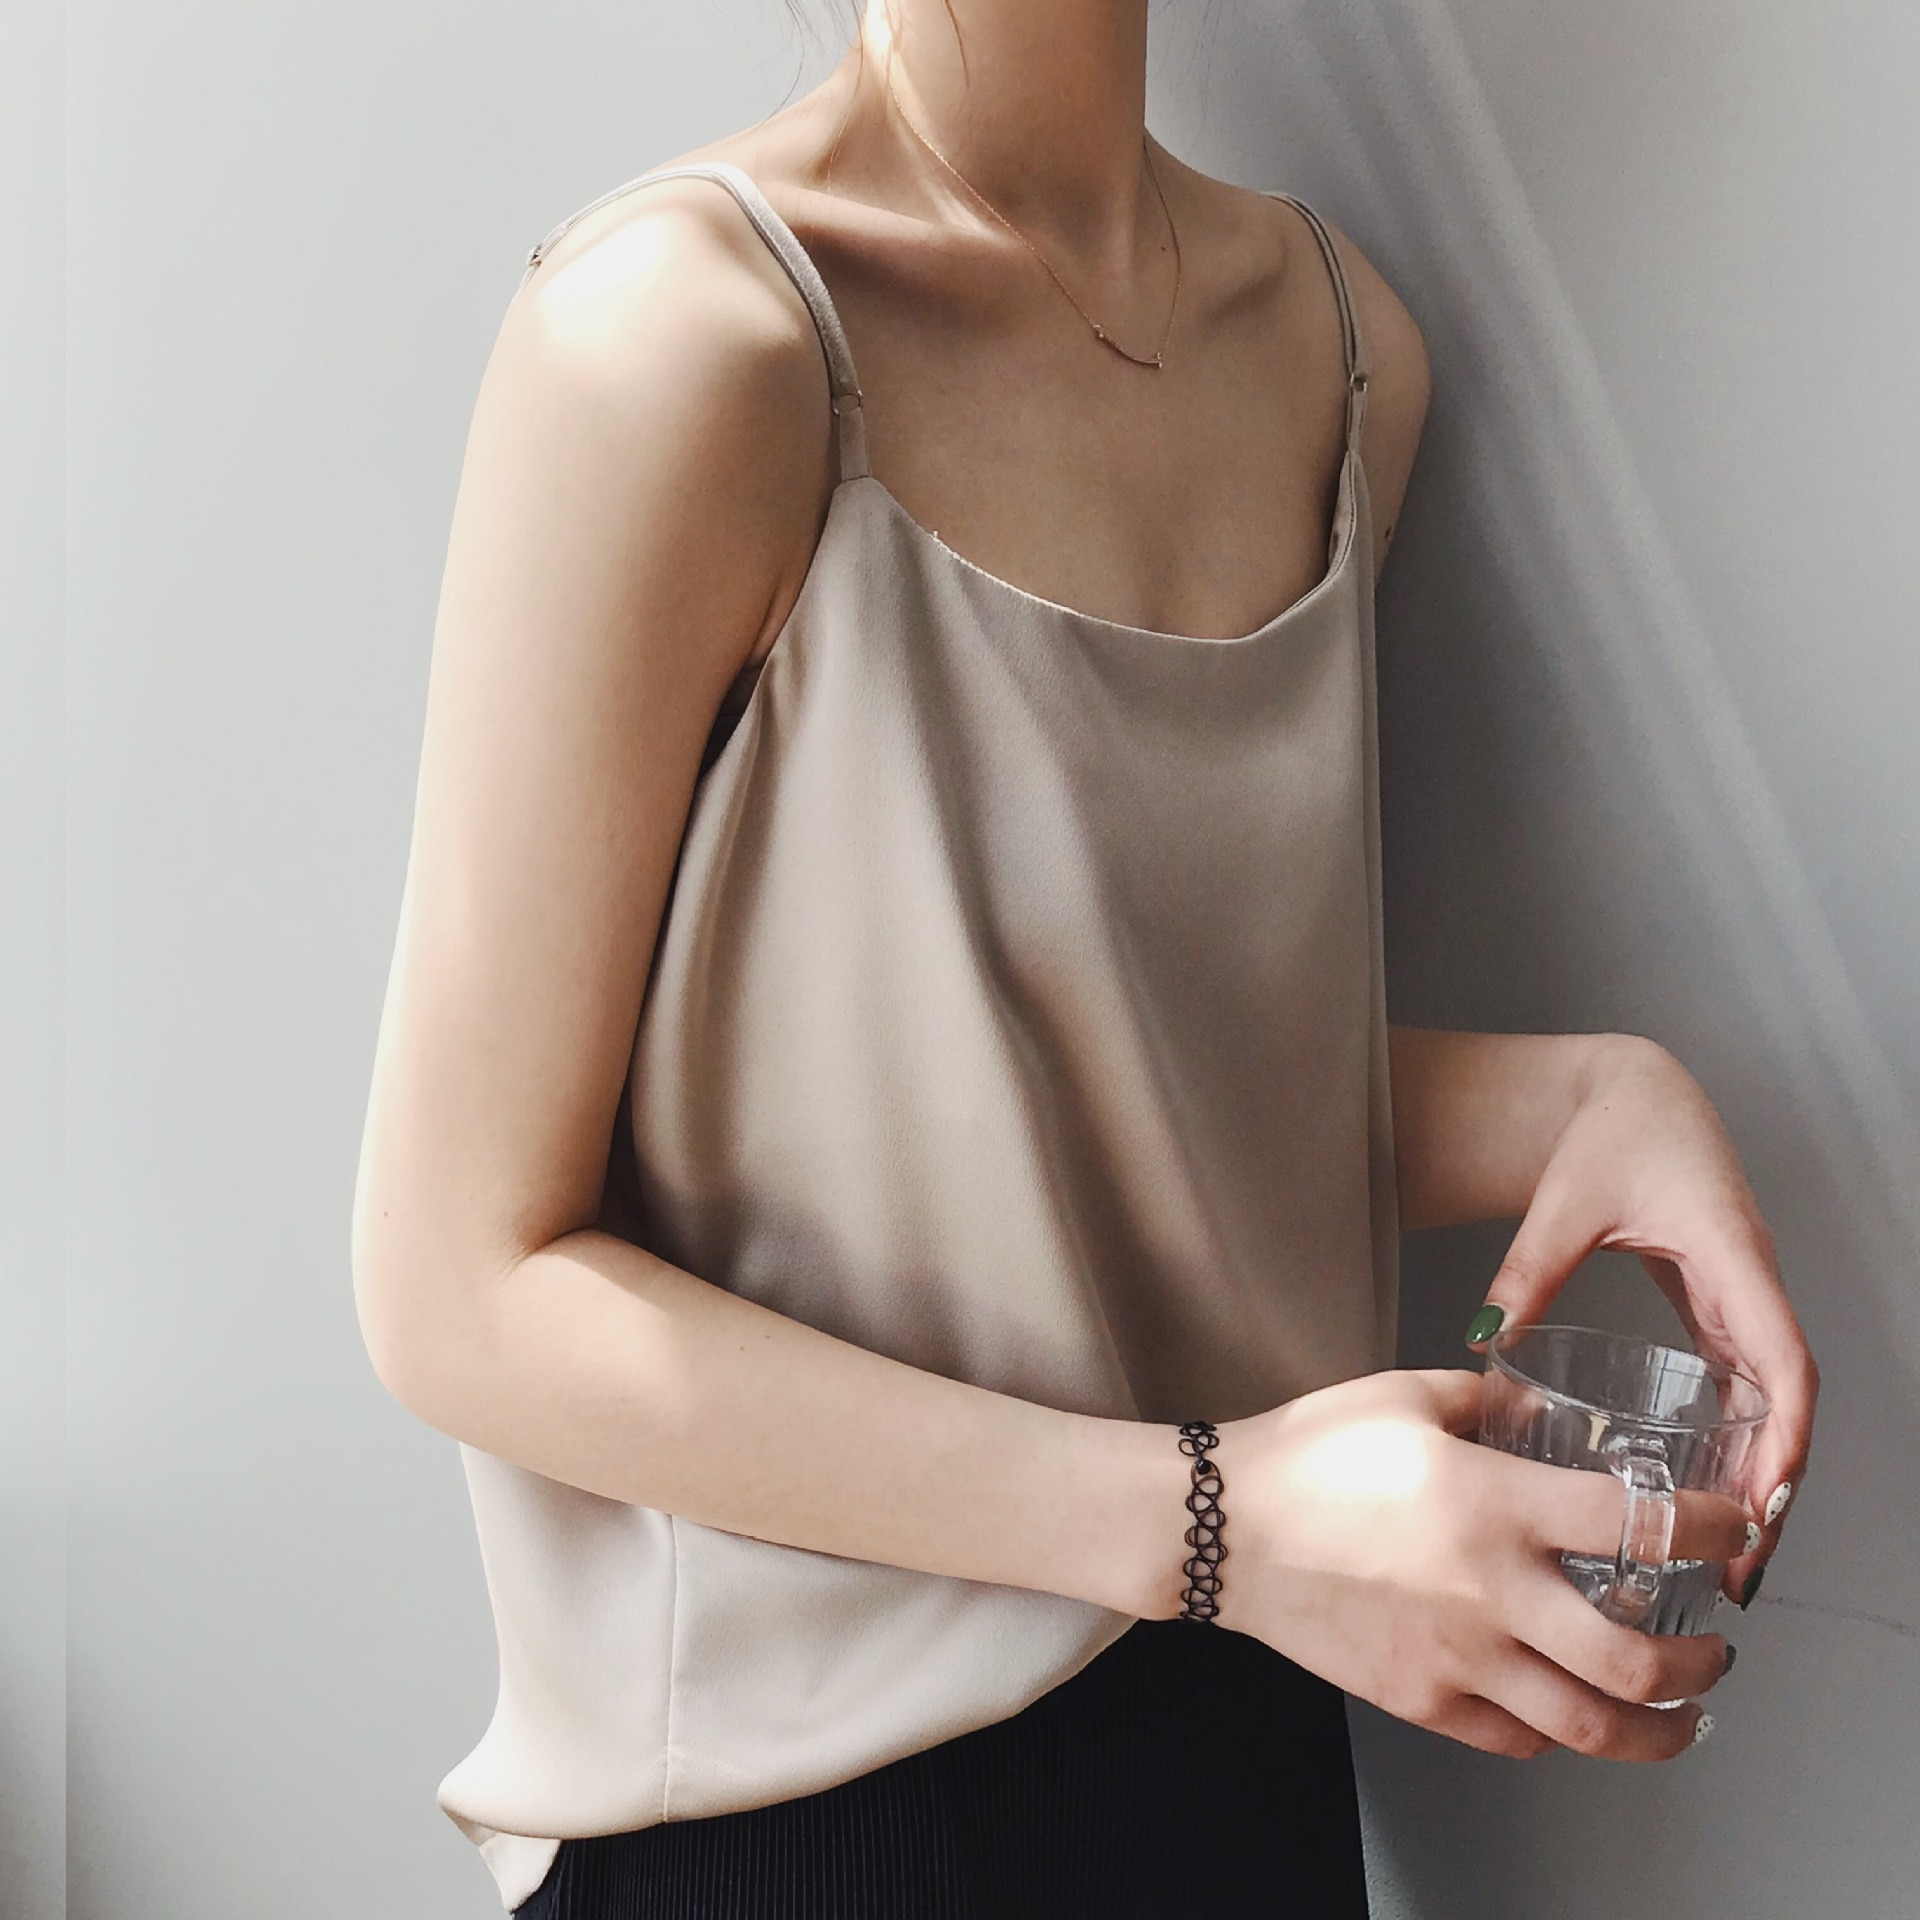 CMAZ Summer Women Camis Silk Satin Tank Top Women Camisole Sleeveless Vest Roupas Femin Cropped 2021